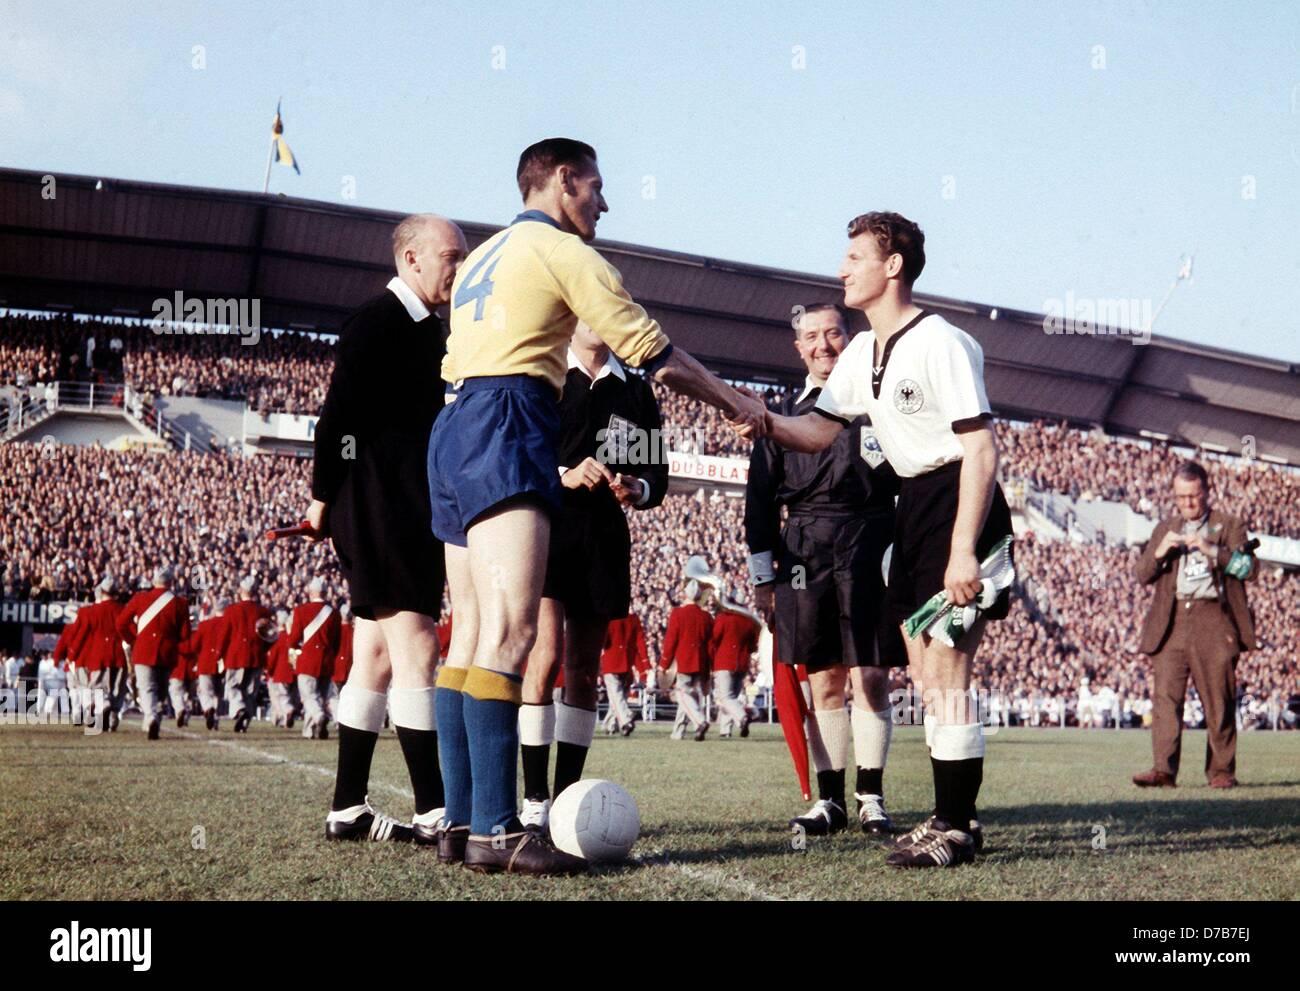 Hans Schaefer r captain of the German national soccer team and